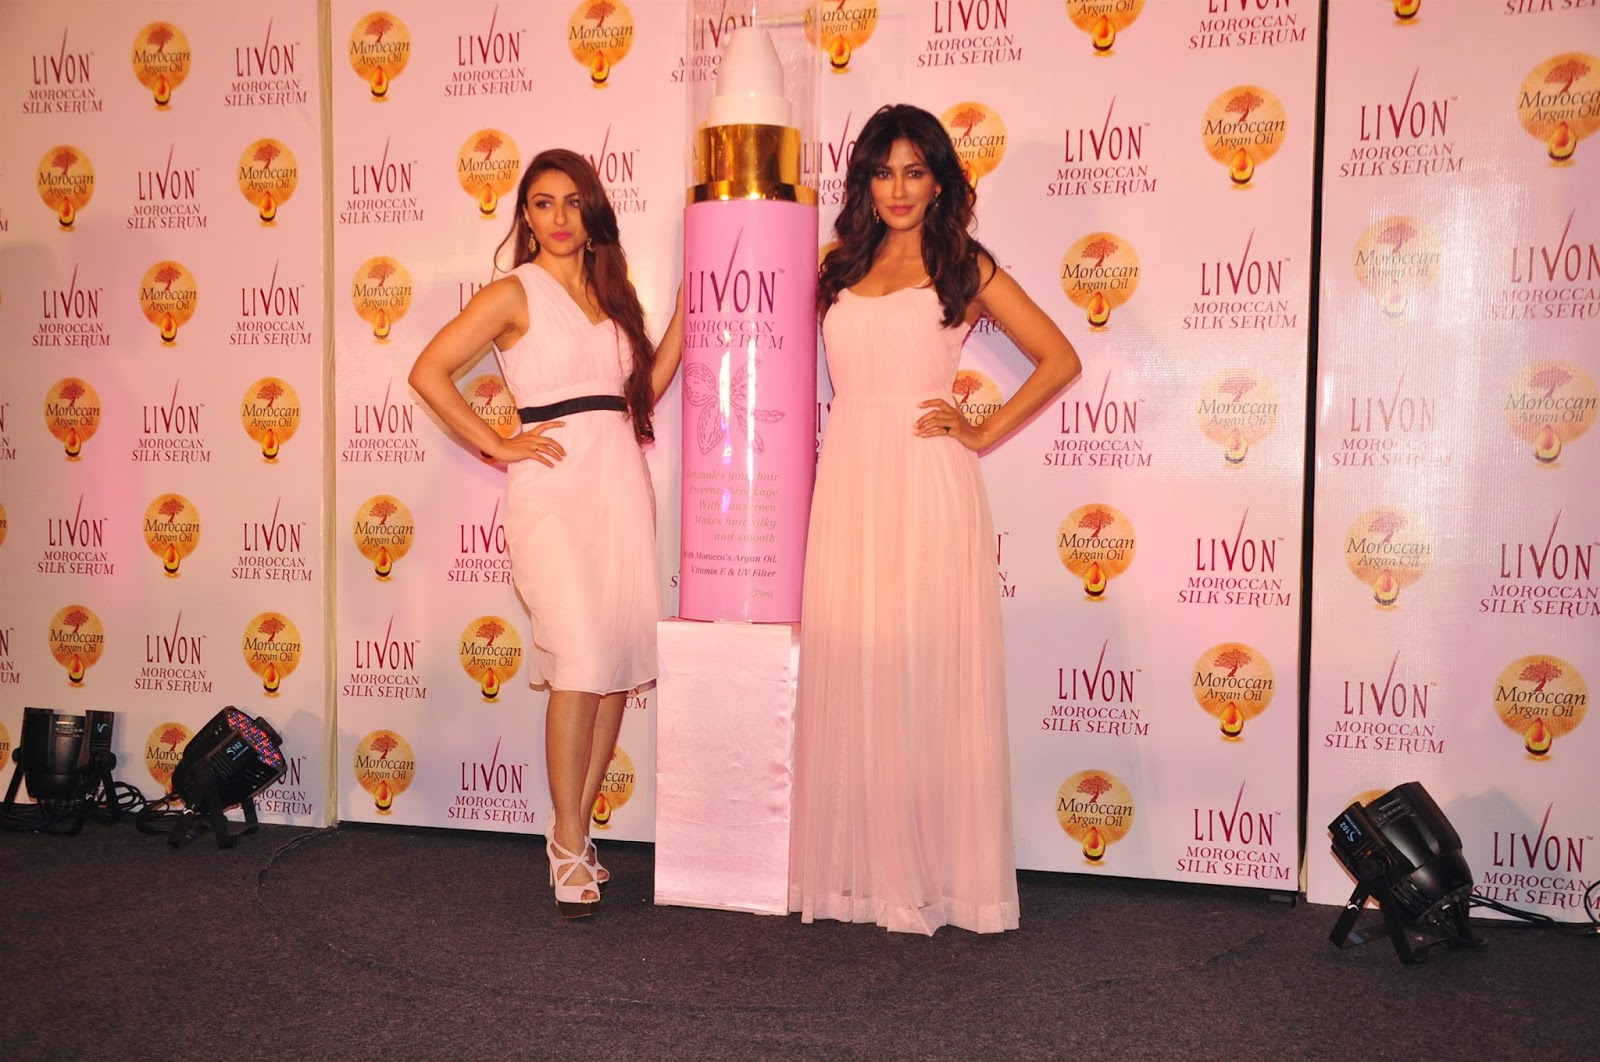 Chitrangda Singh & Soha Ali Khan unveil Livon Moroccan Silk Serum